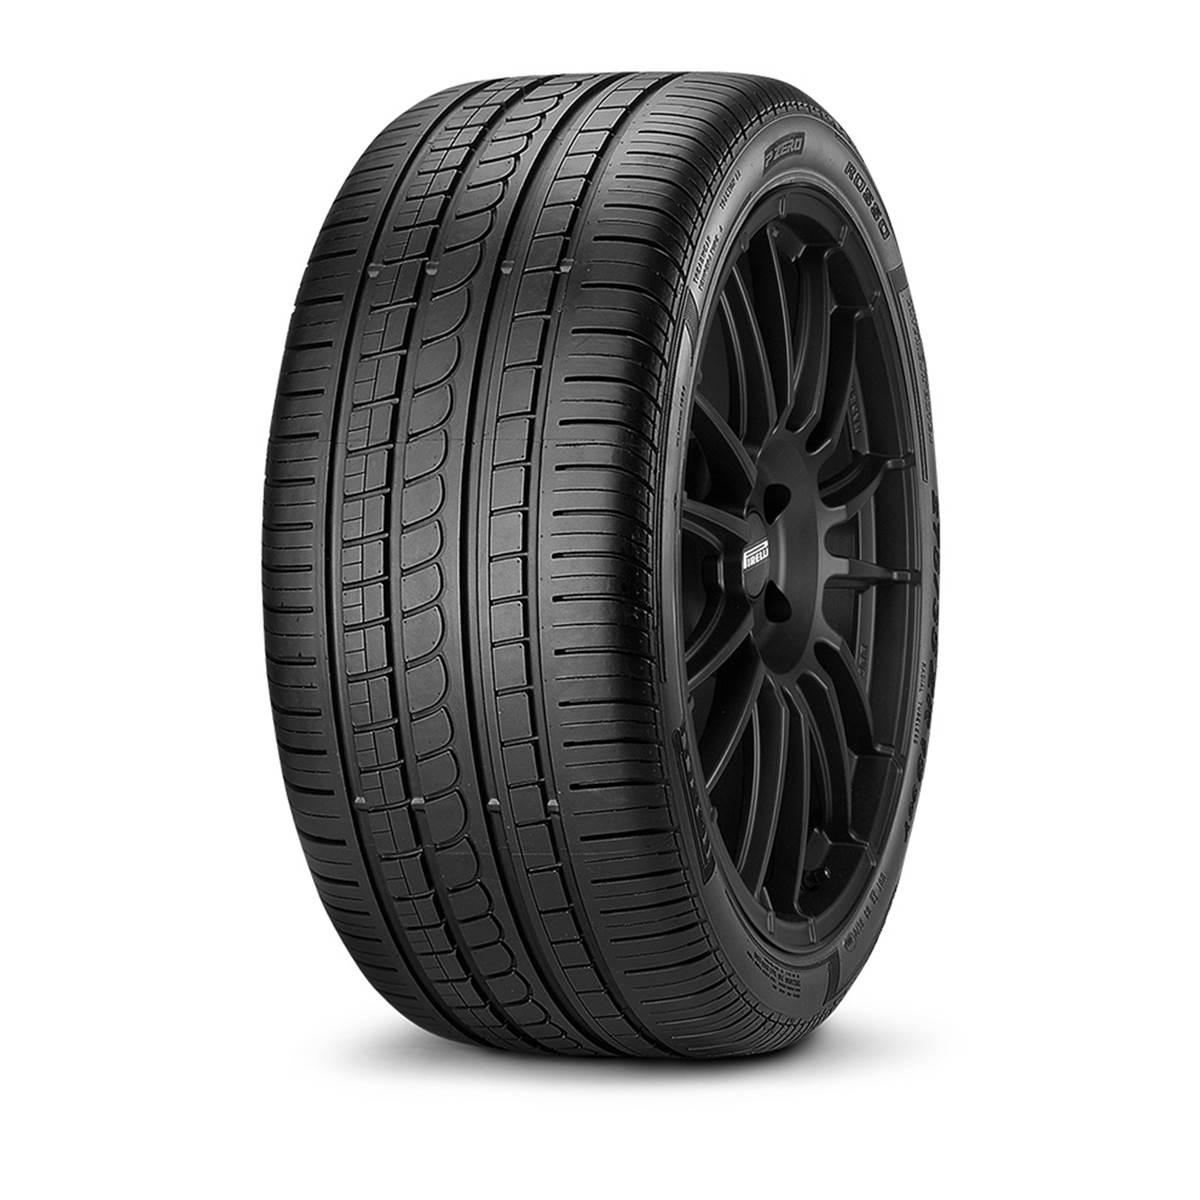 Pneu Pirelli 225/40R18 92Y Pzero Nero (Gt) XL